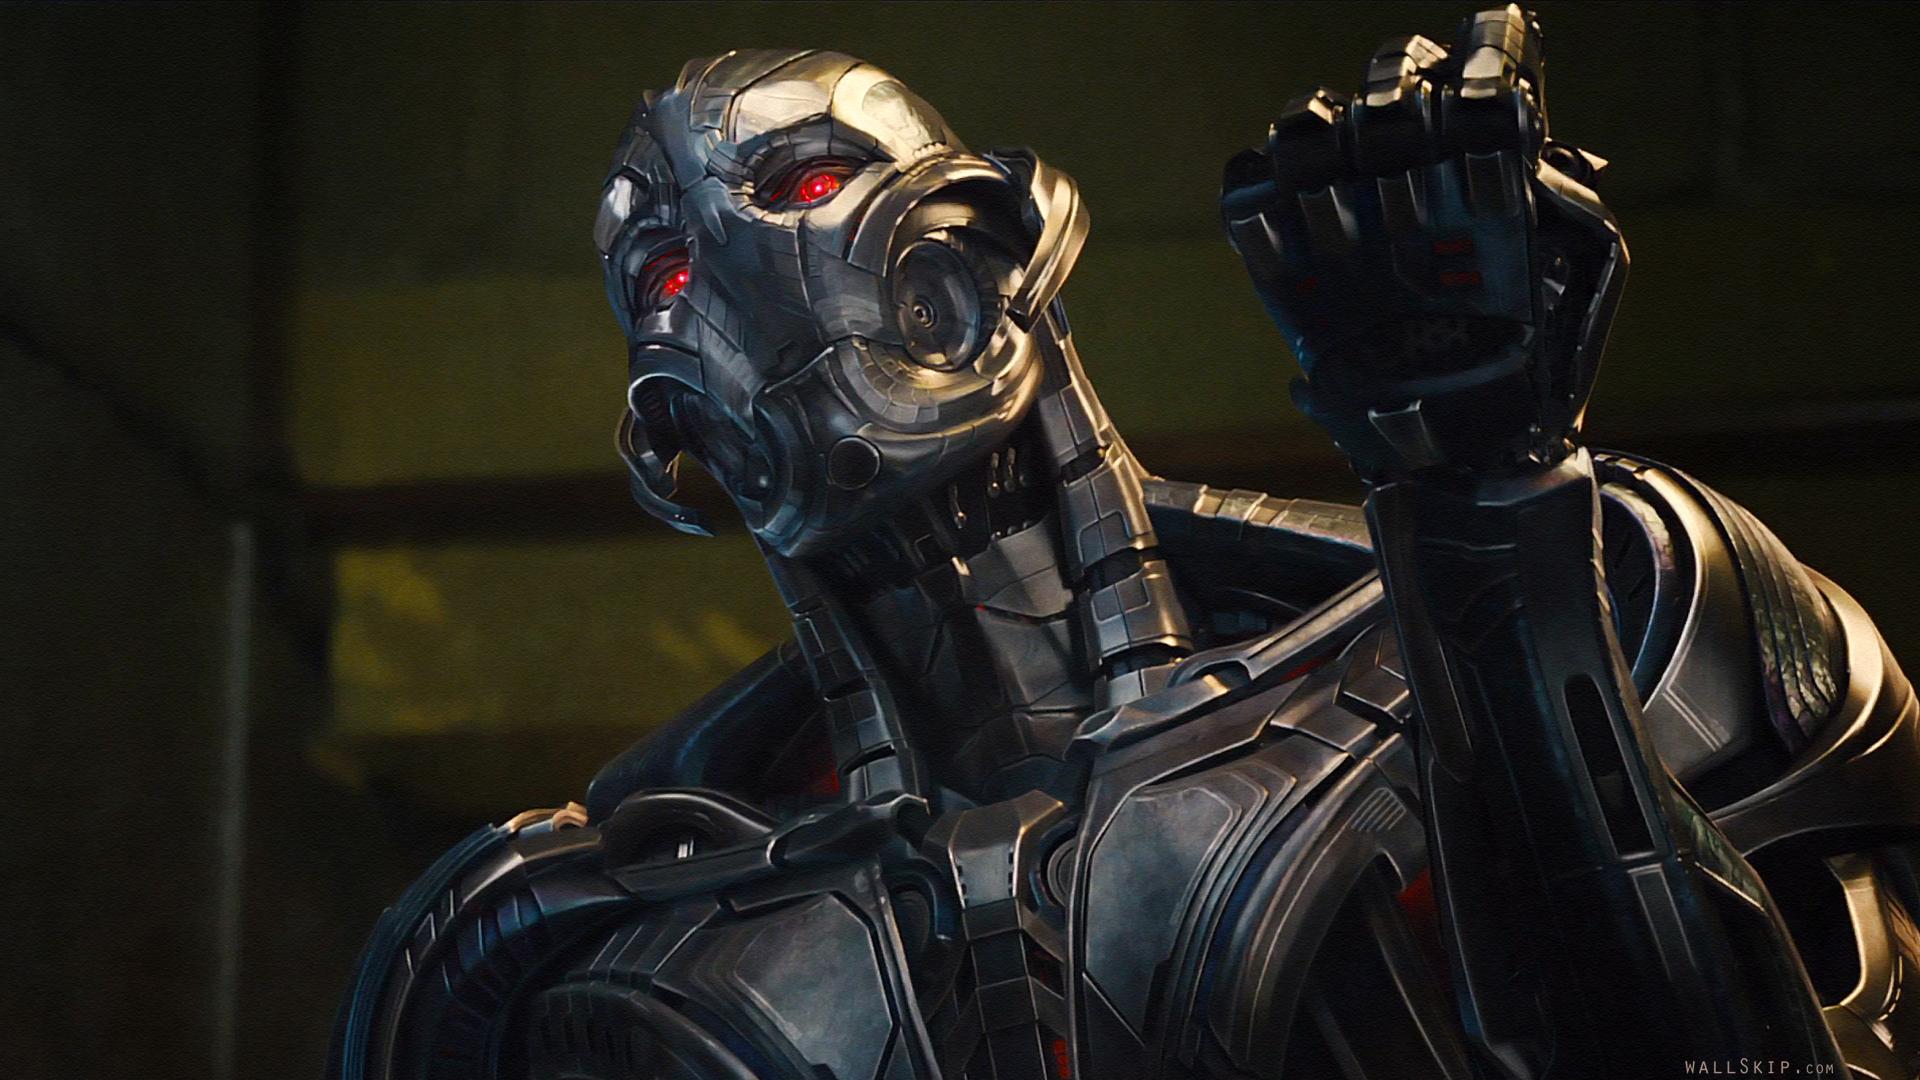 ultron-avengers-age-of-ultron-2015-movie-1920x1080.jpg